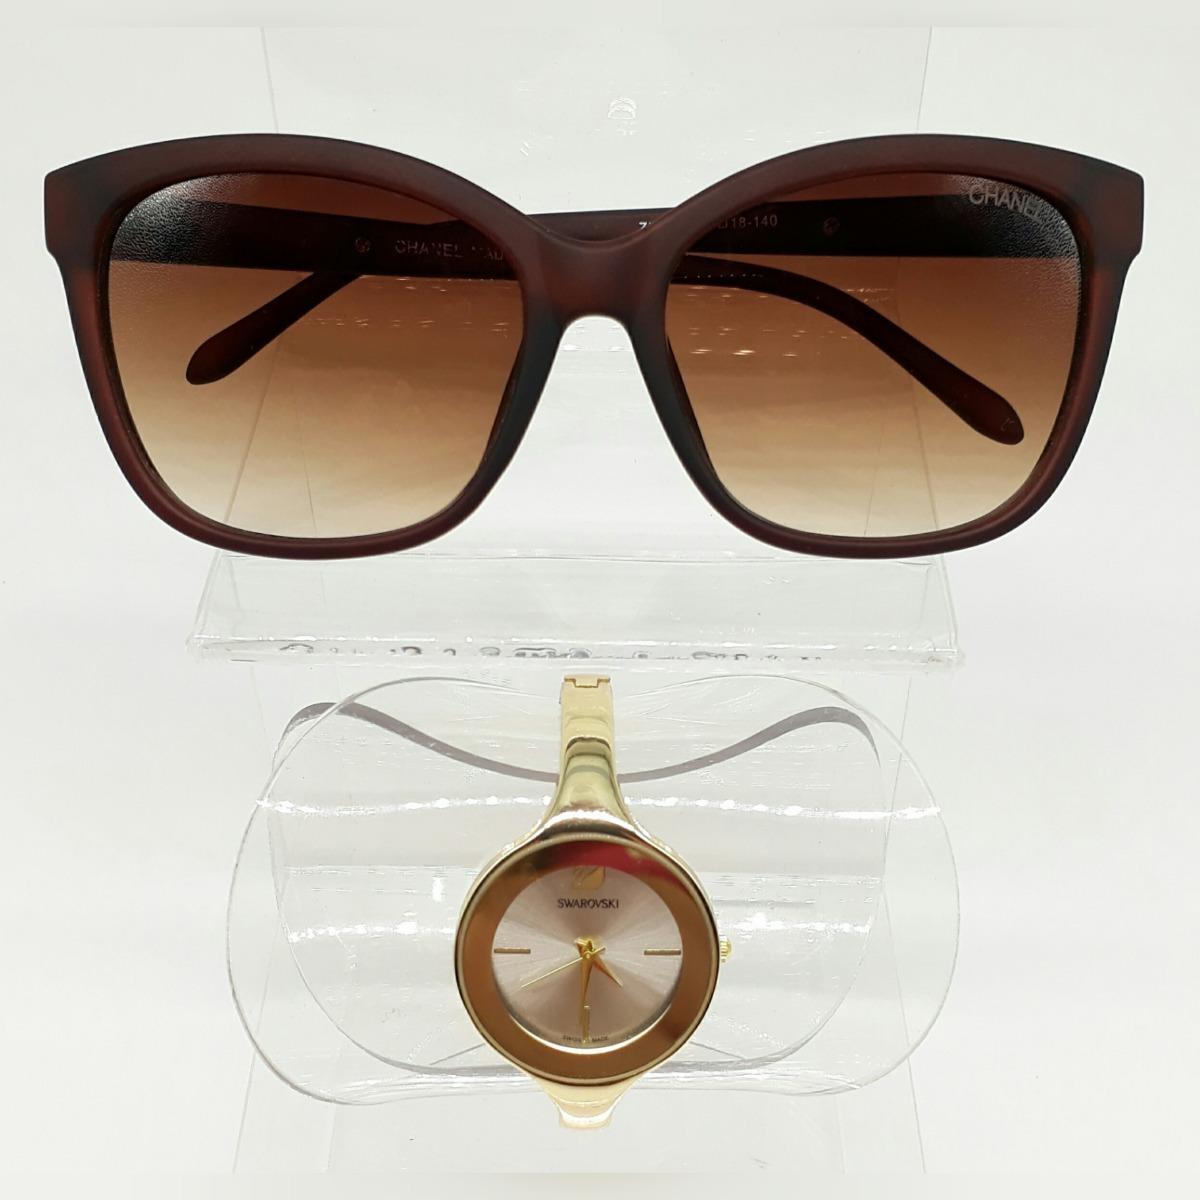 f867aa598511e relógio feminino esporte fino + óculos de sol ch classico. Carregando zoom.